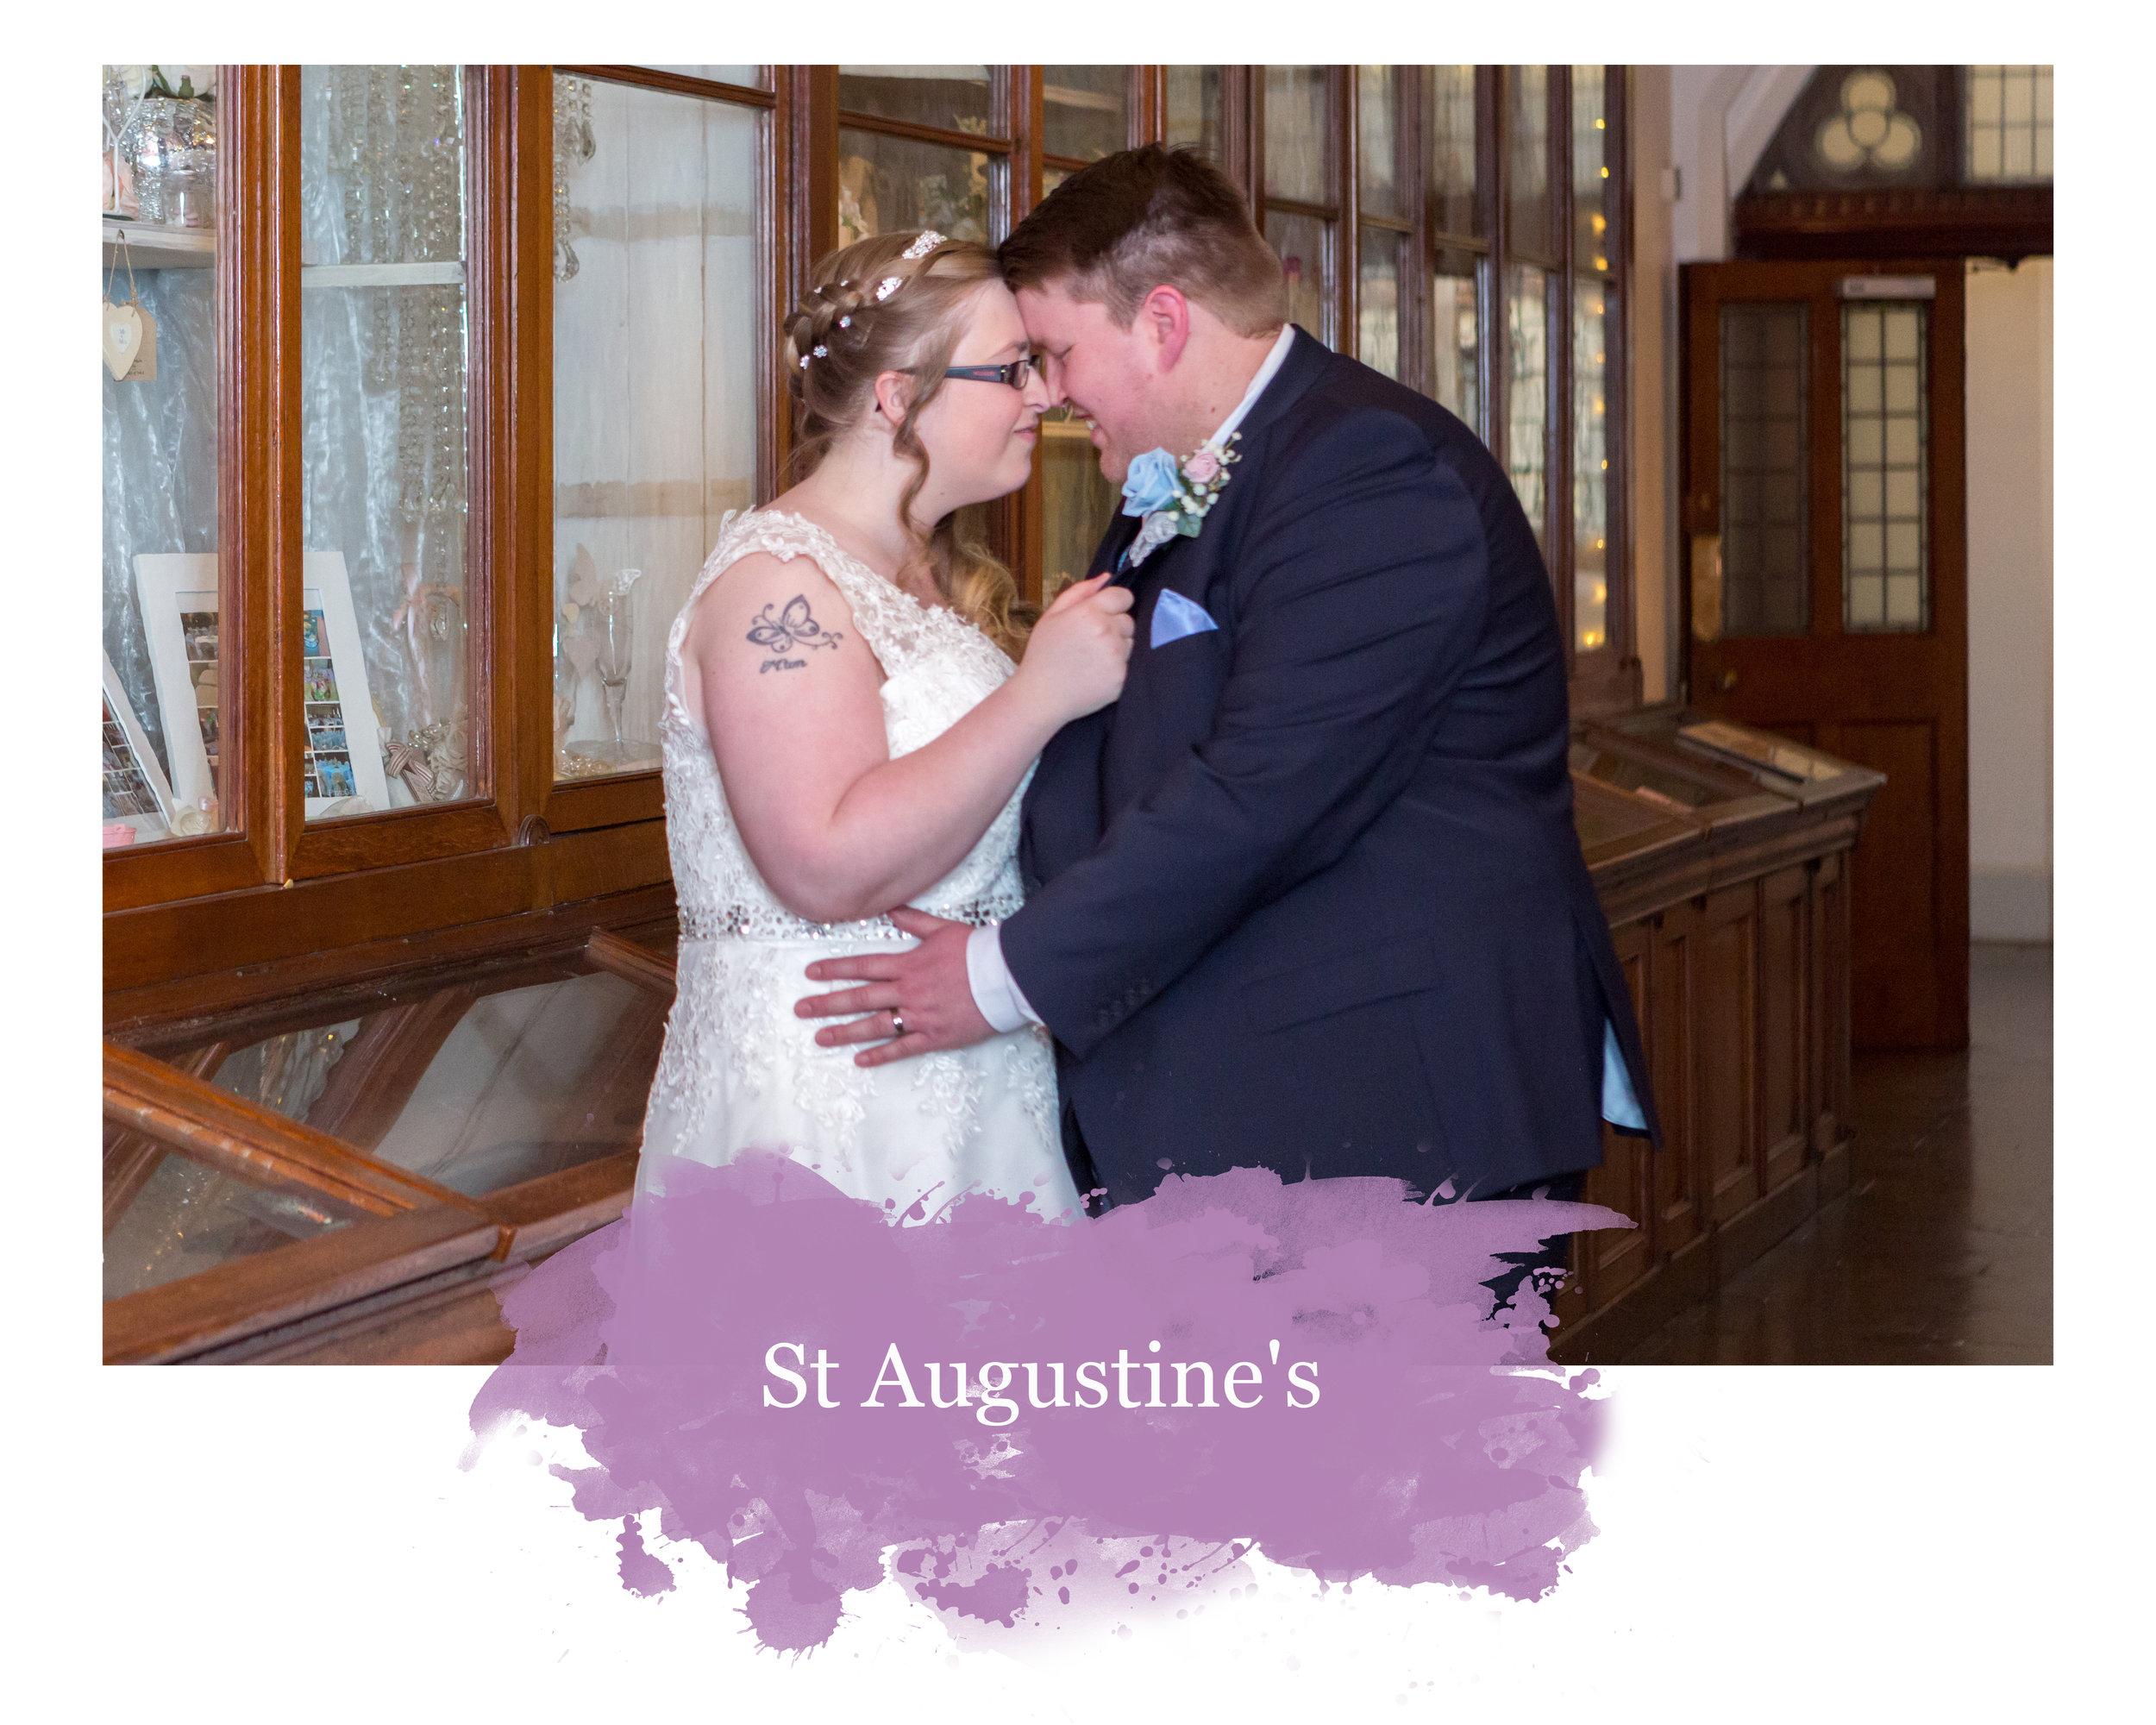 St Augustine's.jpg